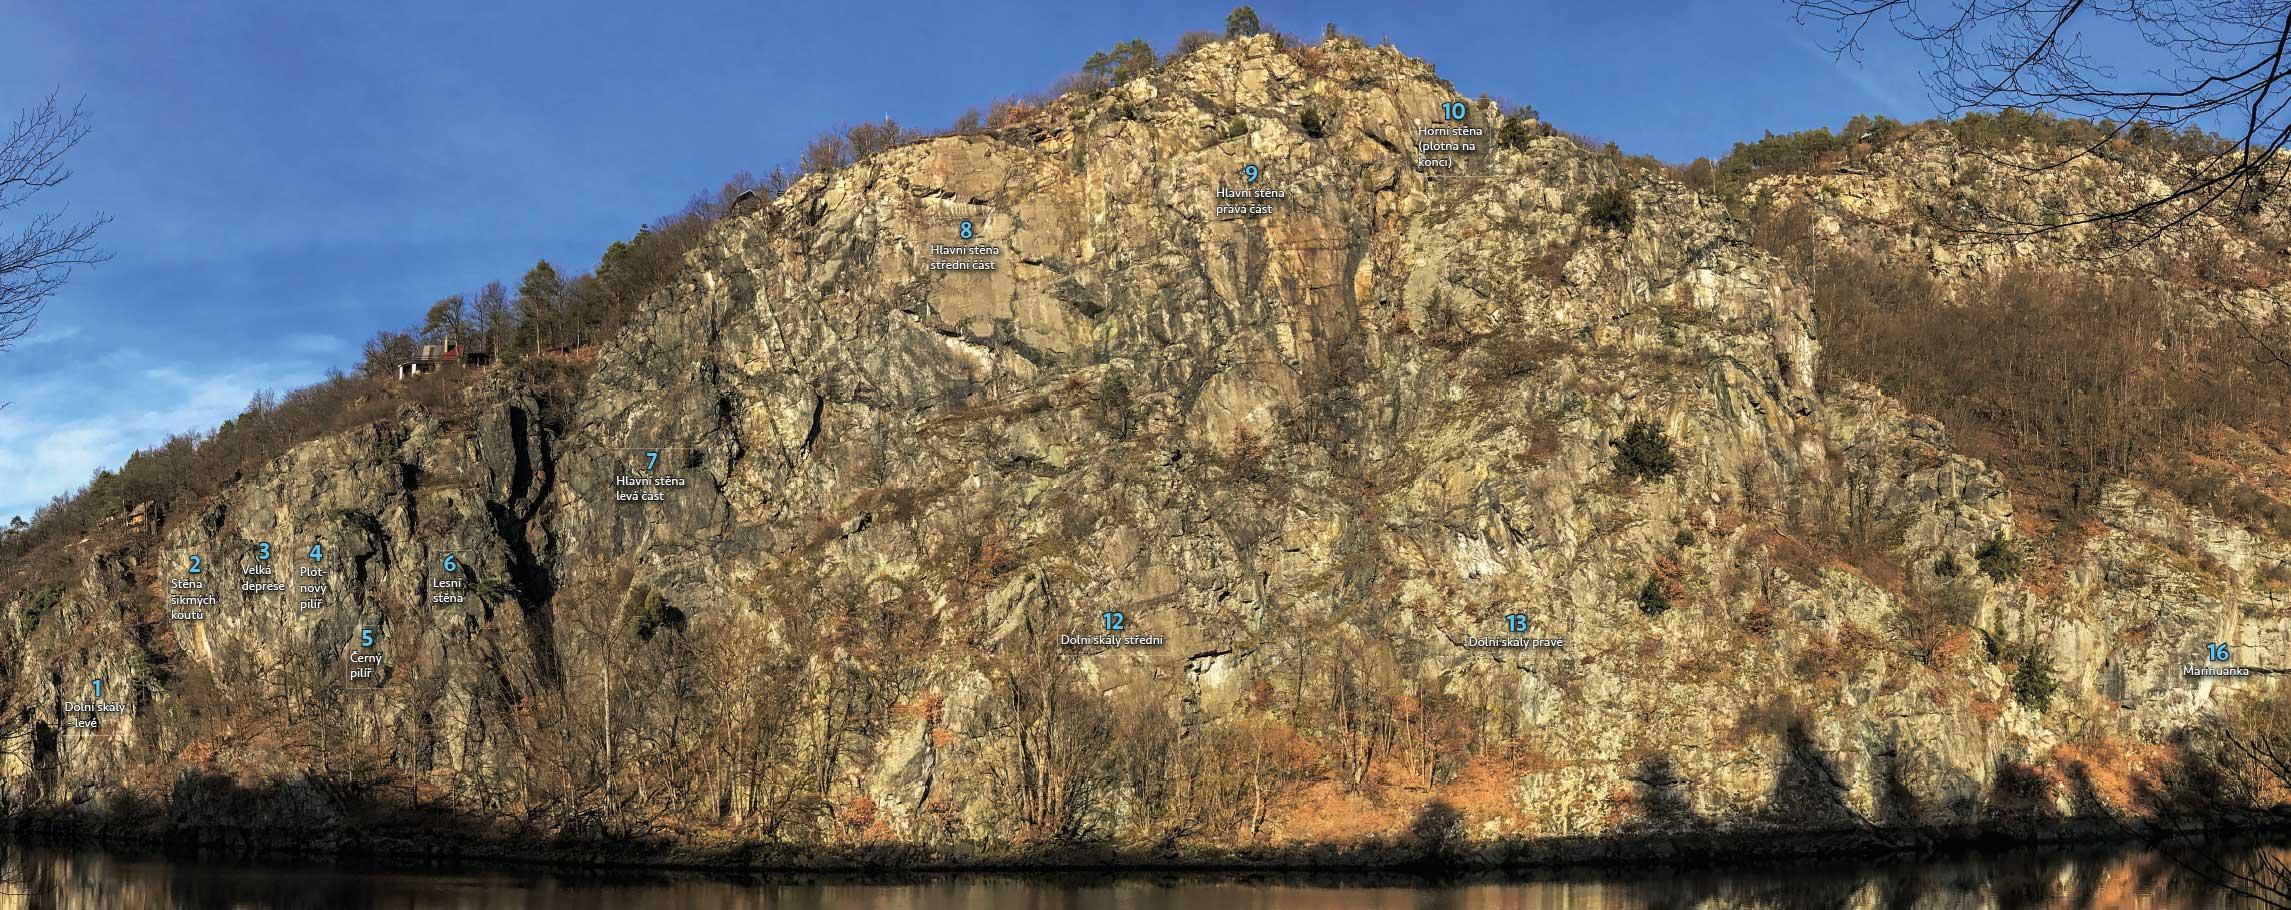 Mařenka - schéma skal